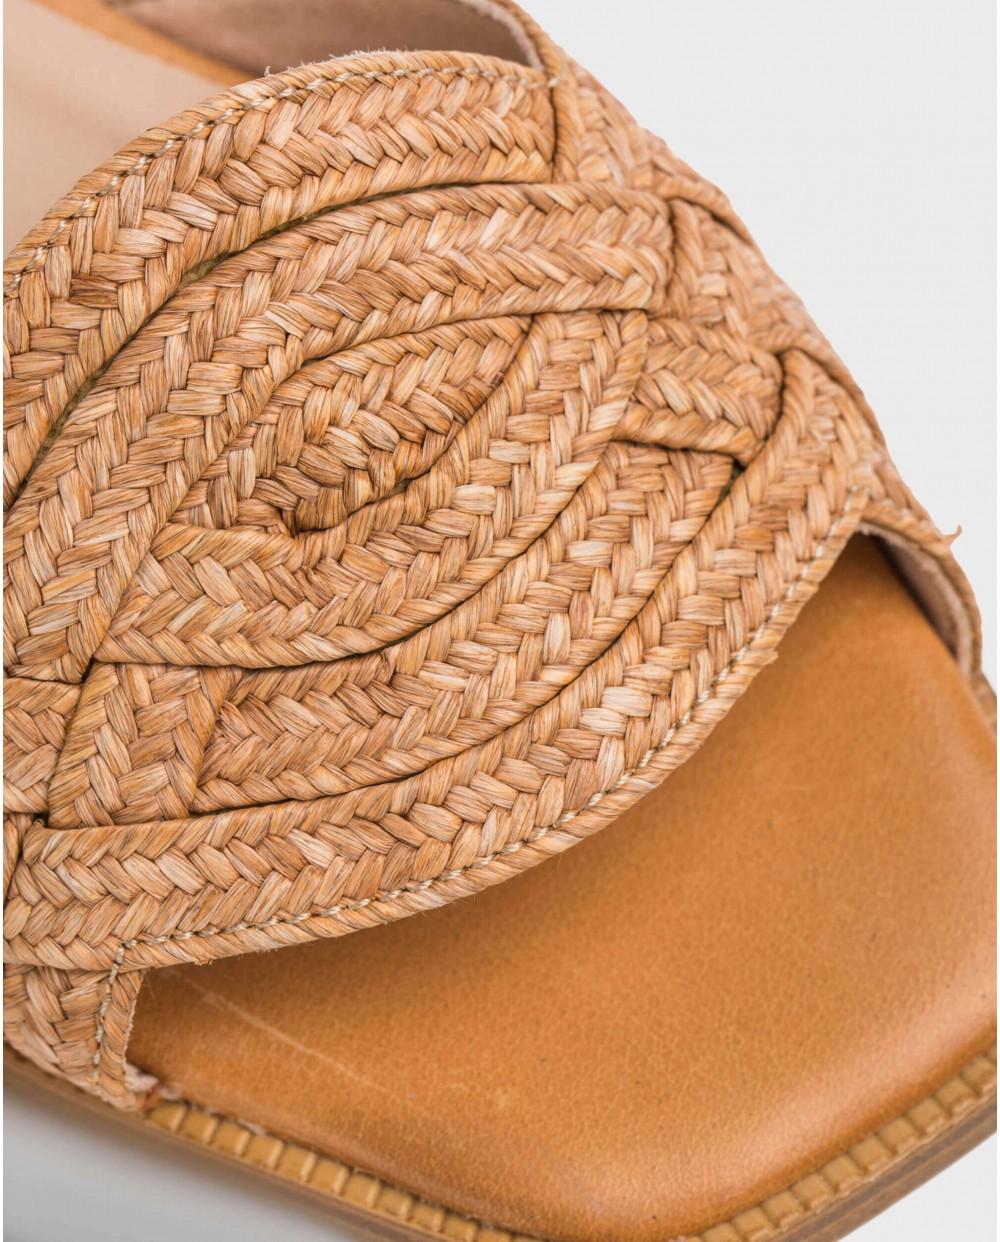 Wonders-Sandals-Sandal with raffia detail